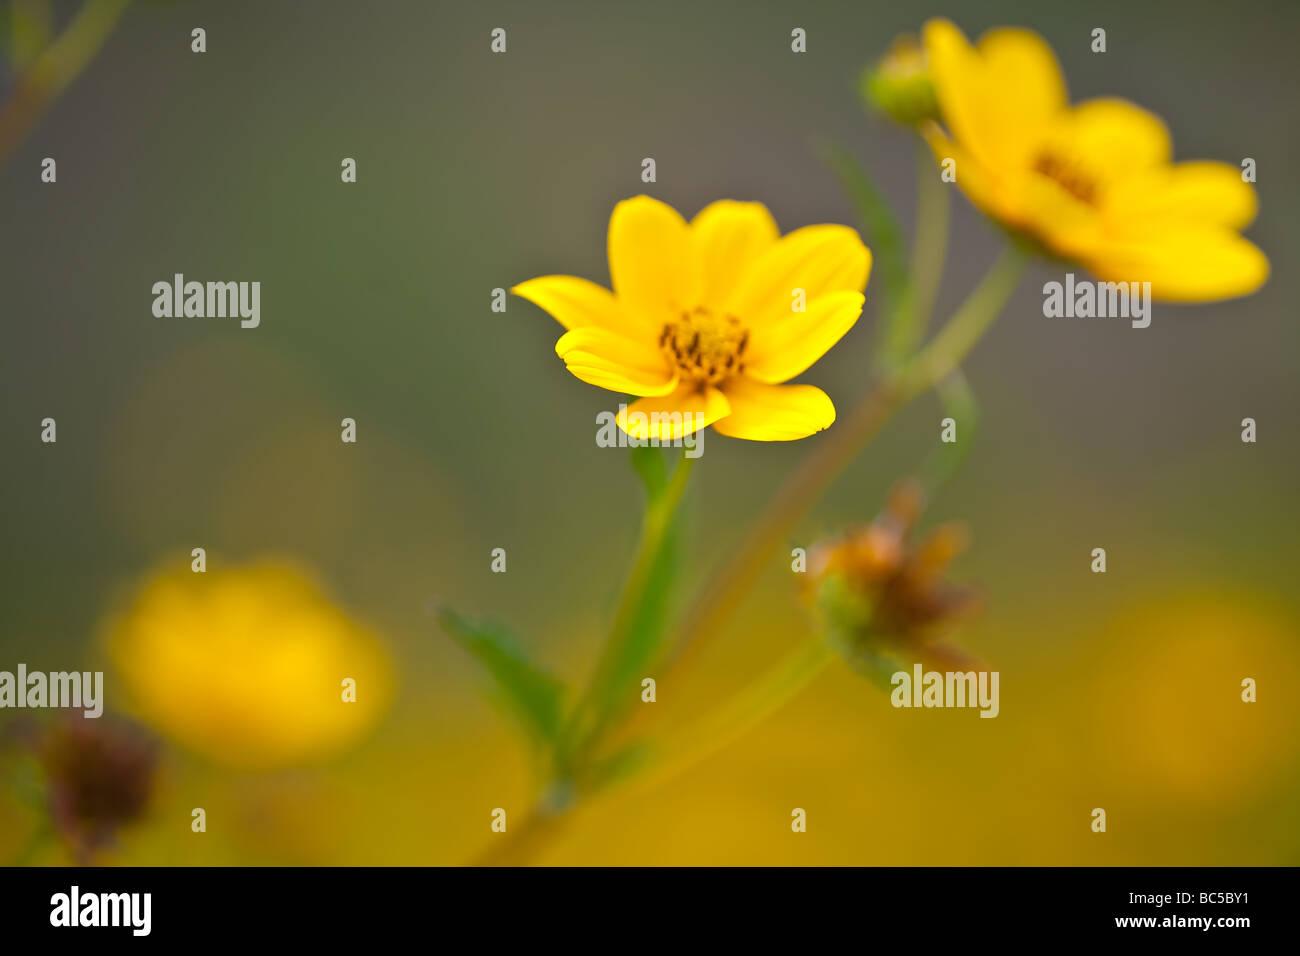 Bidens Aristosa - Stock Image